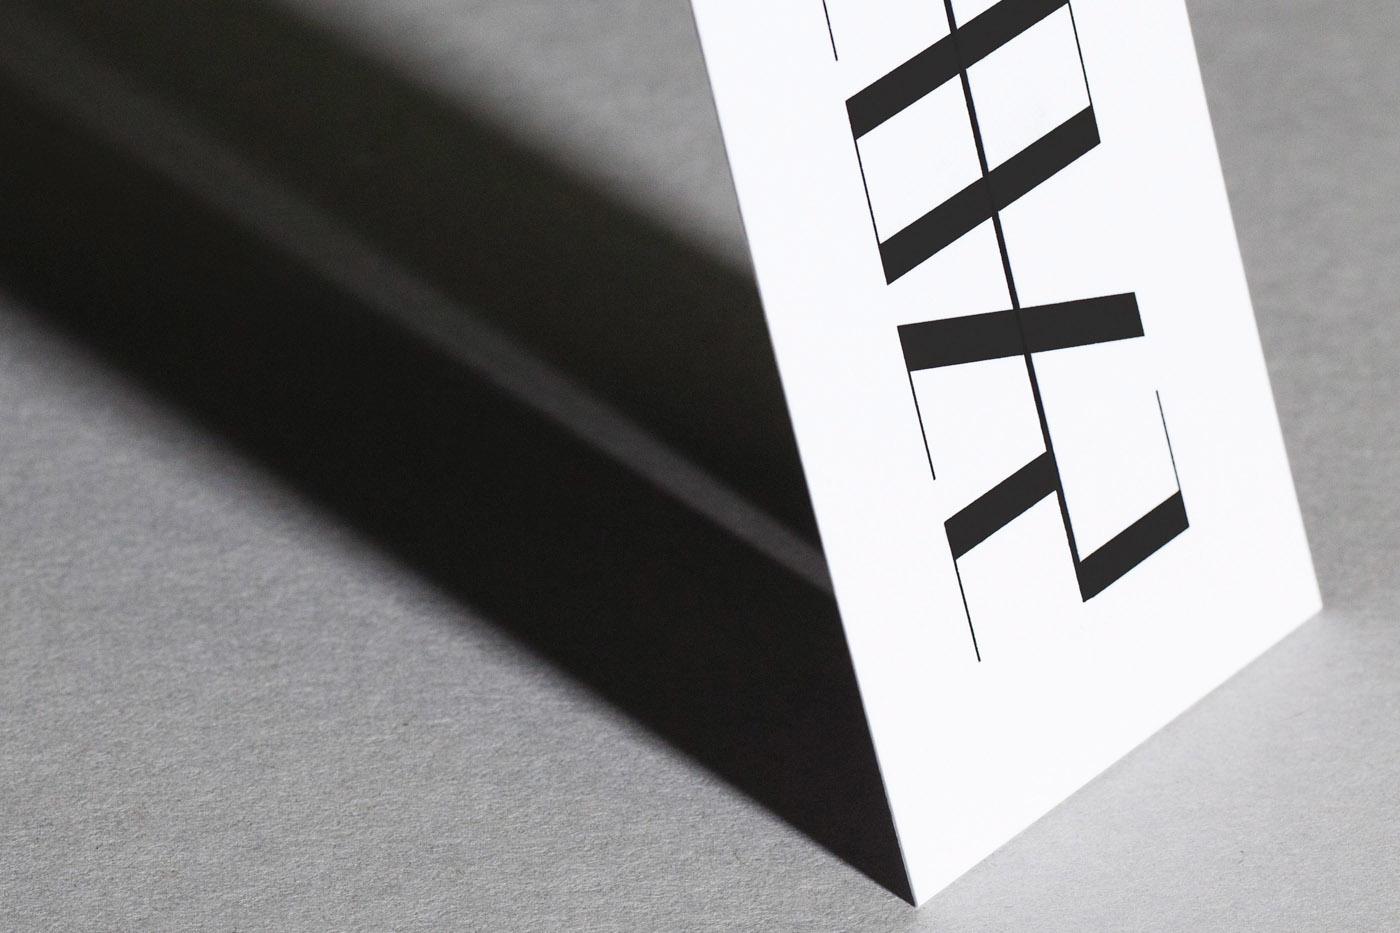 bc business card brand identity press logo type font dream Travel line auto-generative pattern